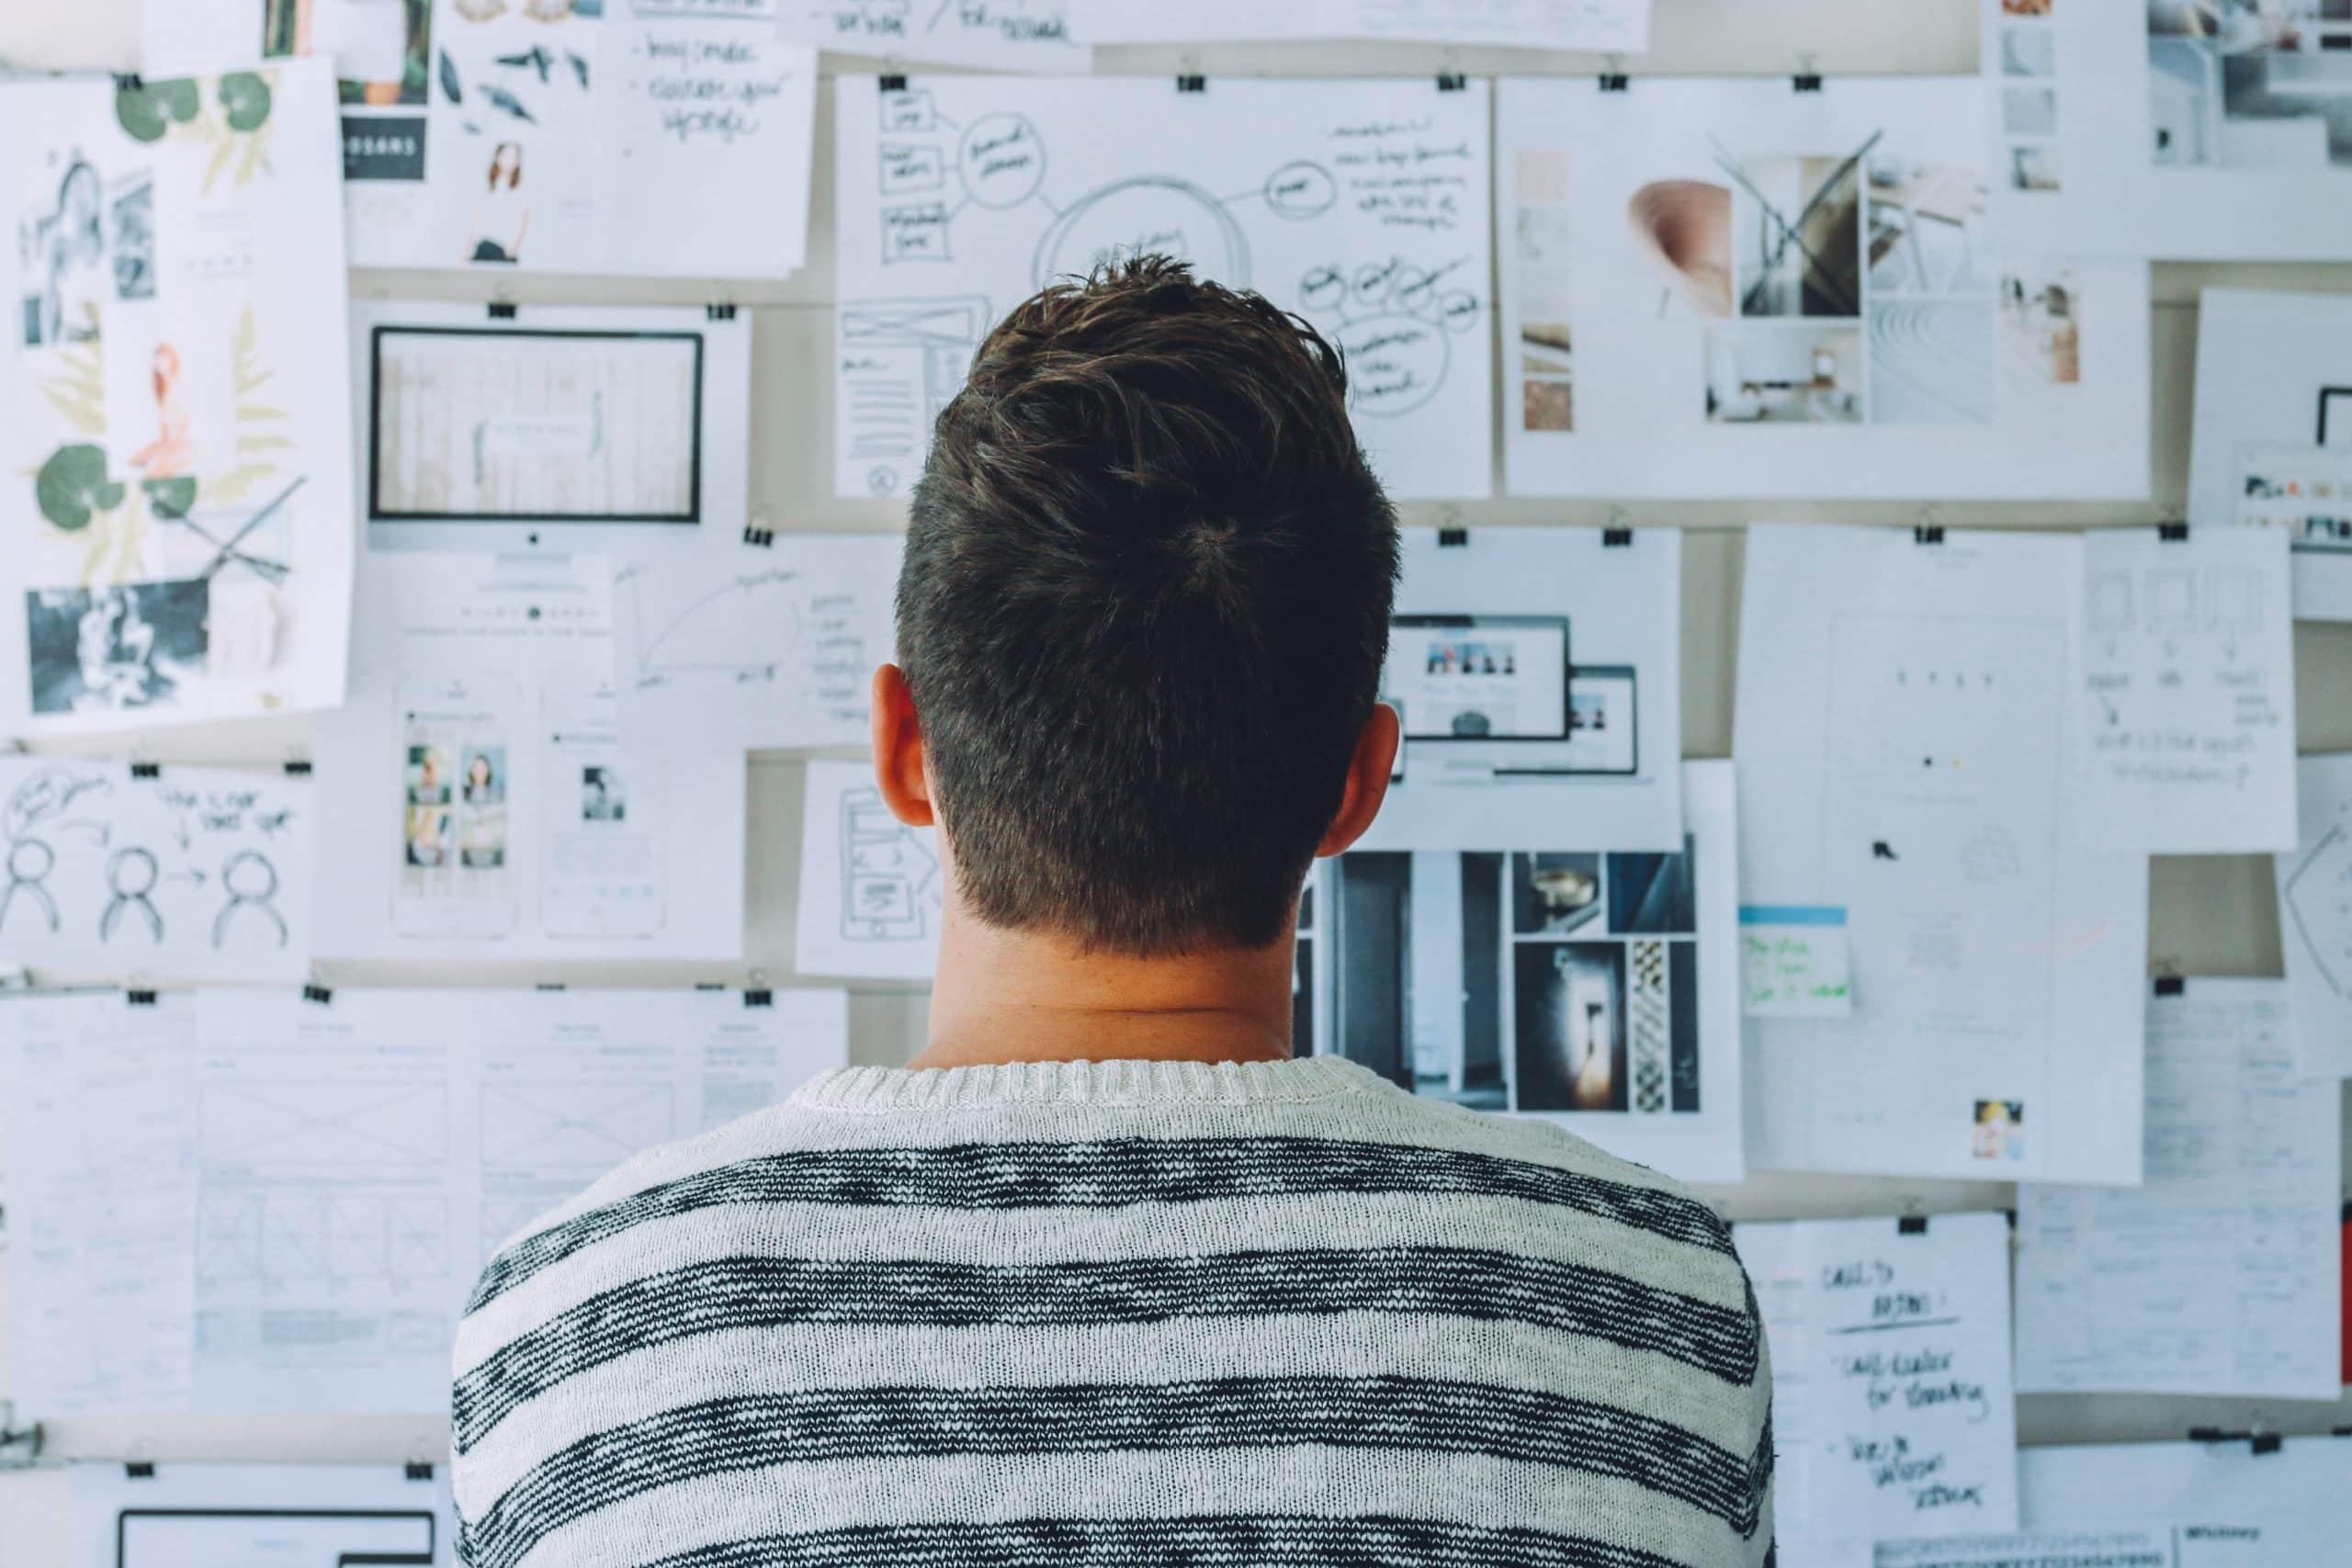 idee per aprire startup